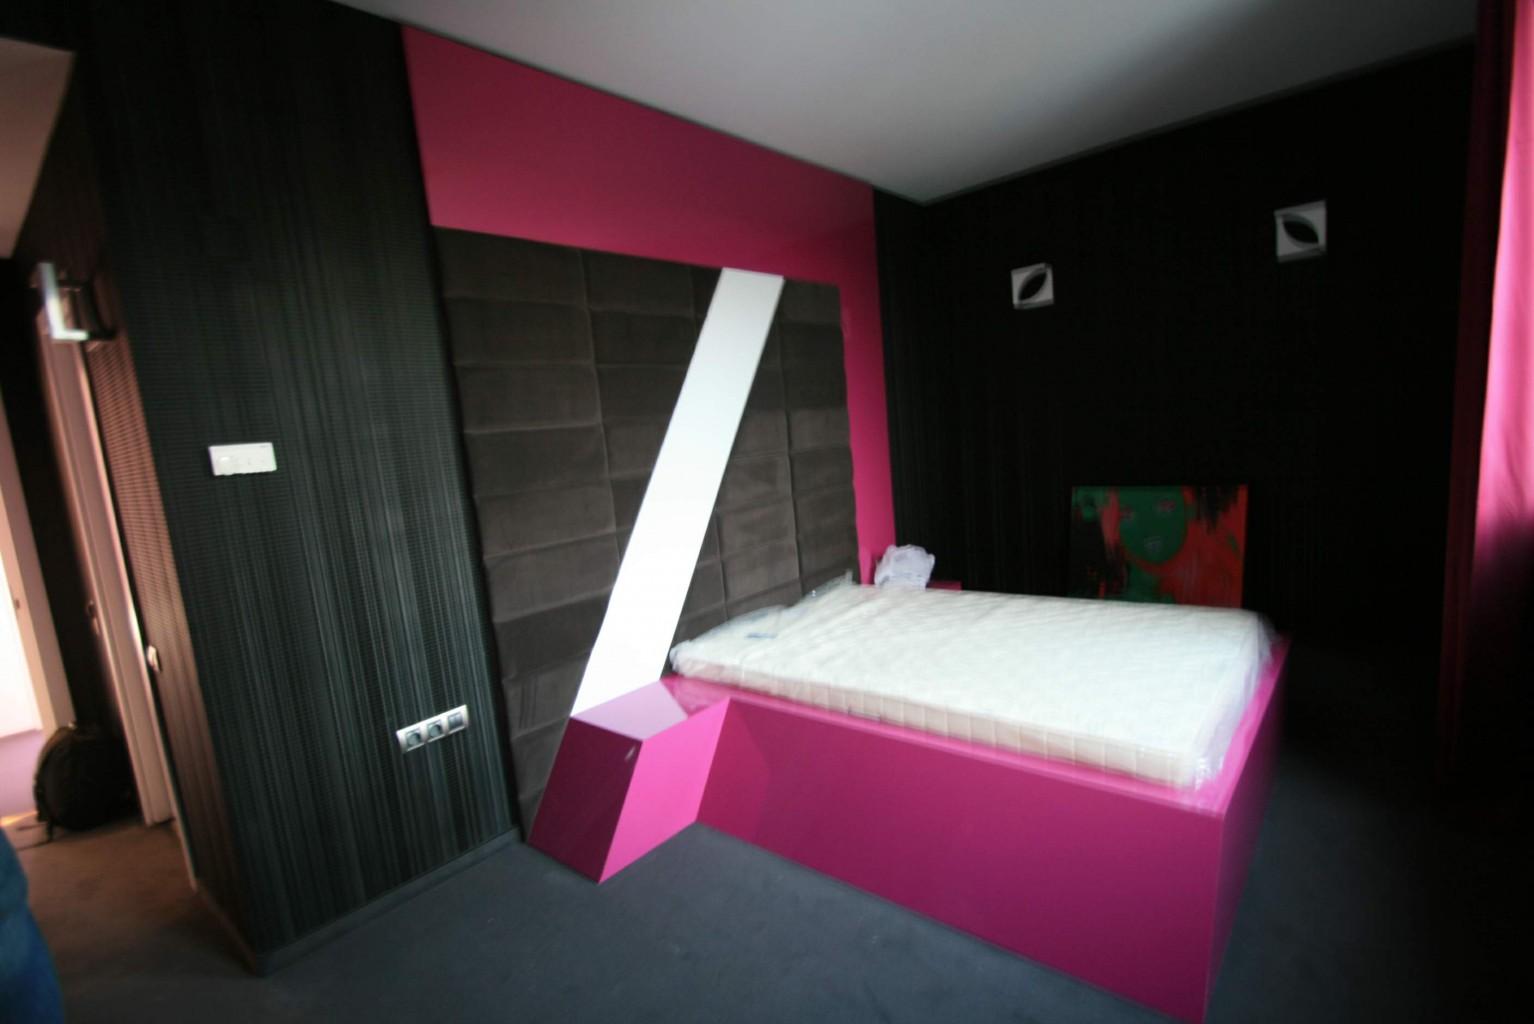 camera hotel plaza design placare mobilier hpl tapiterie plexiglas